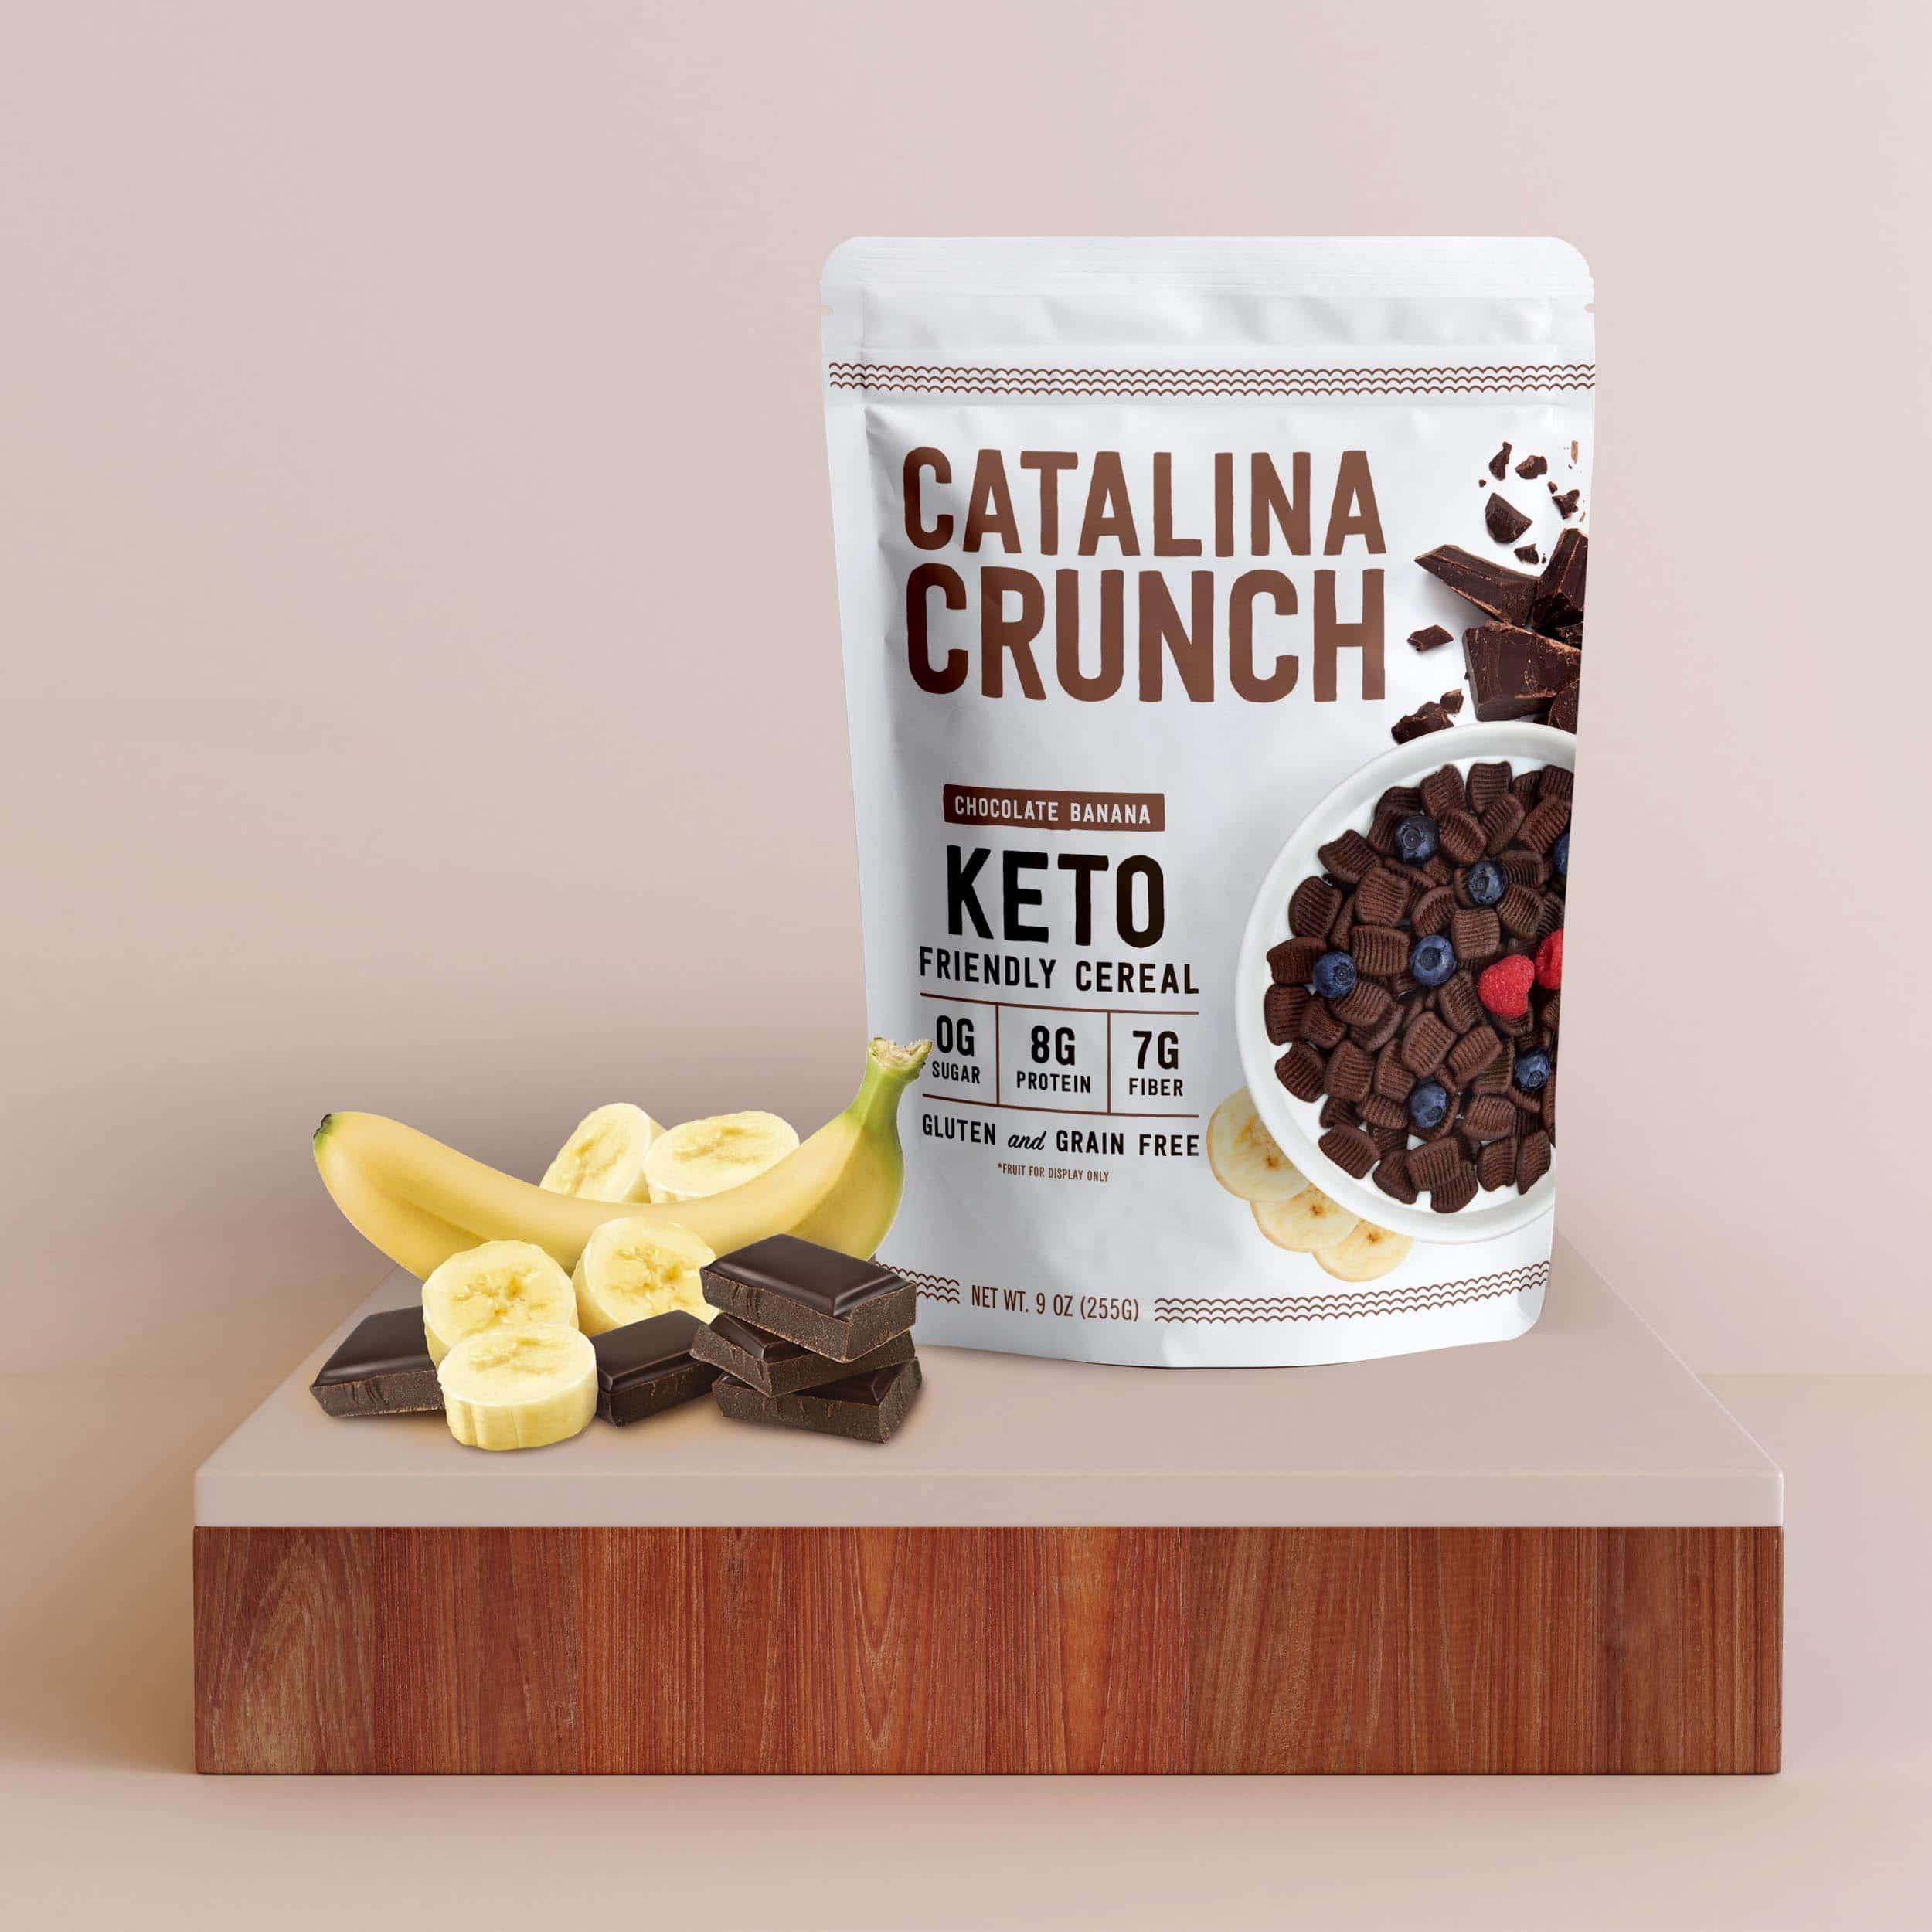 Catalina Crunch Launches Chocolate Banana Cereal - NOSH